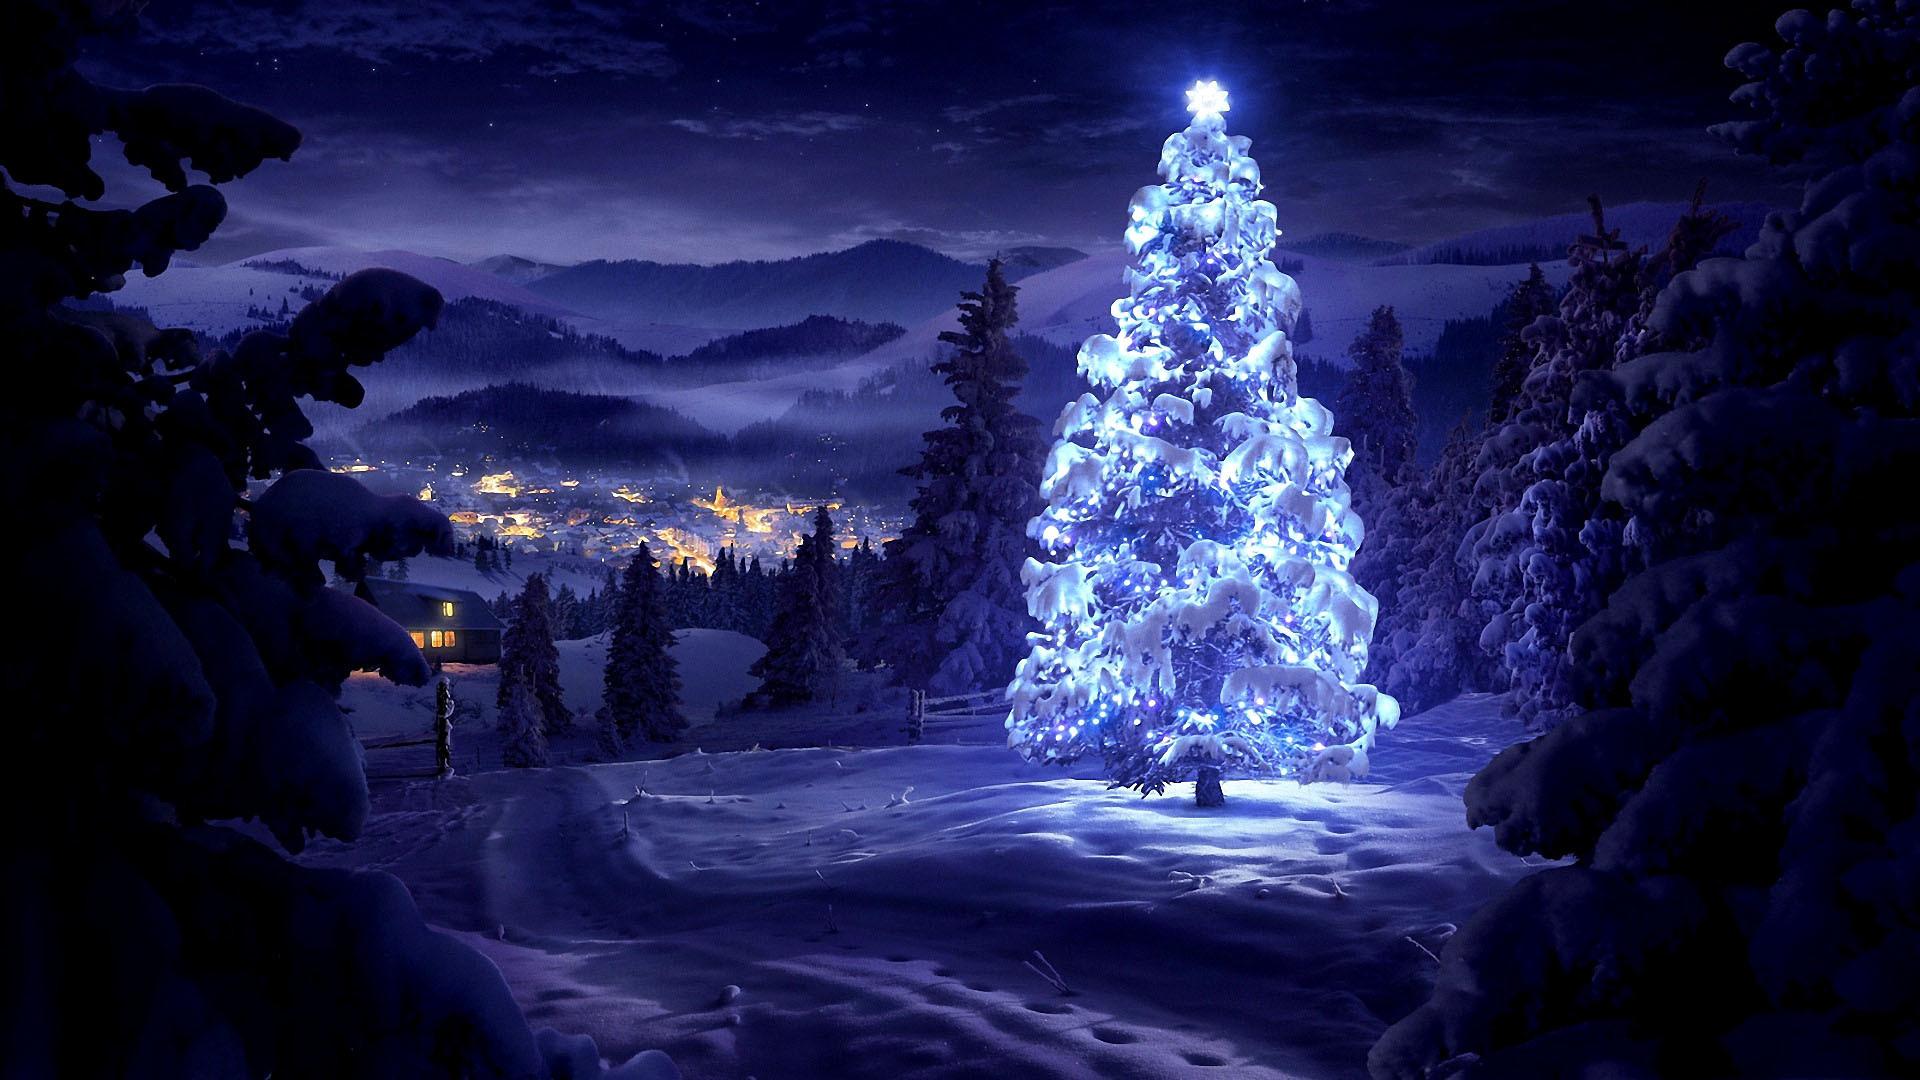 Christmas Desktop theme Wallpaper 58 images